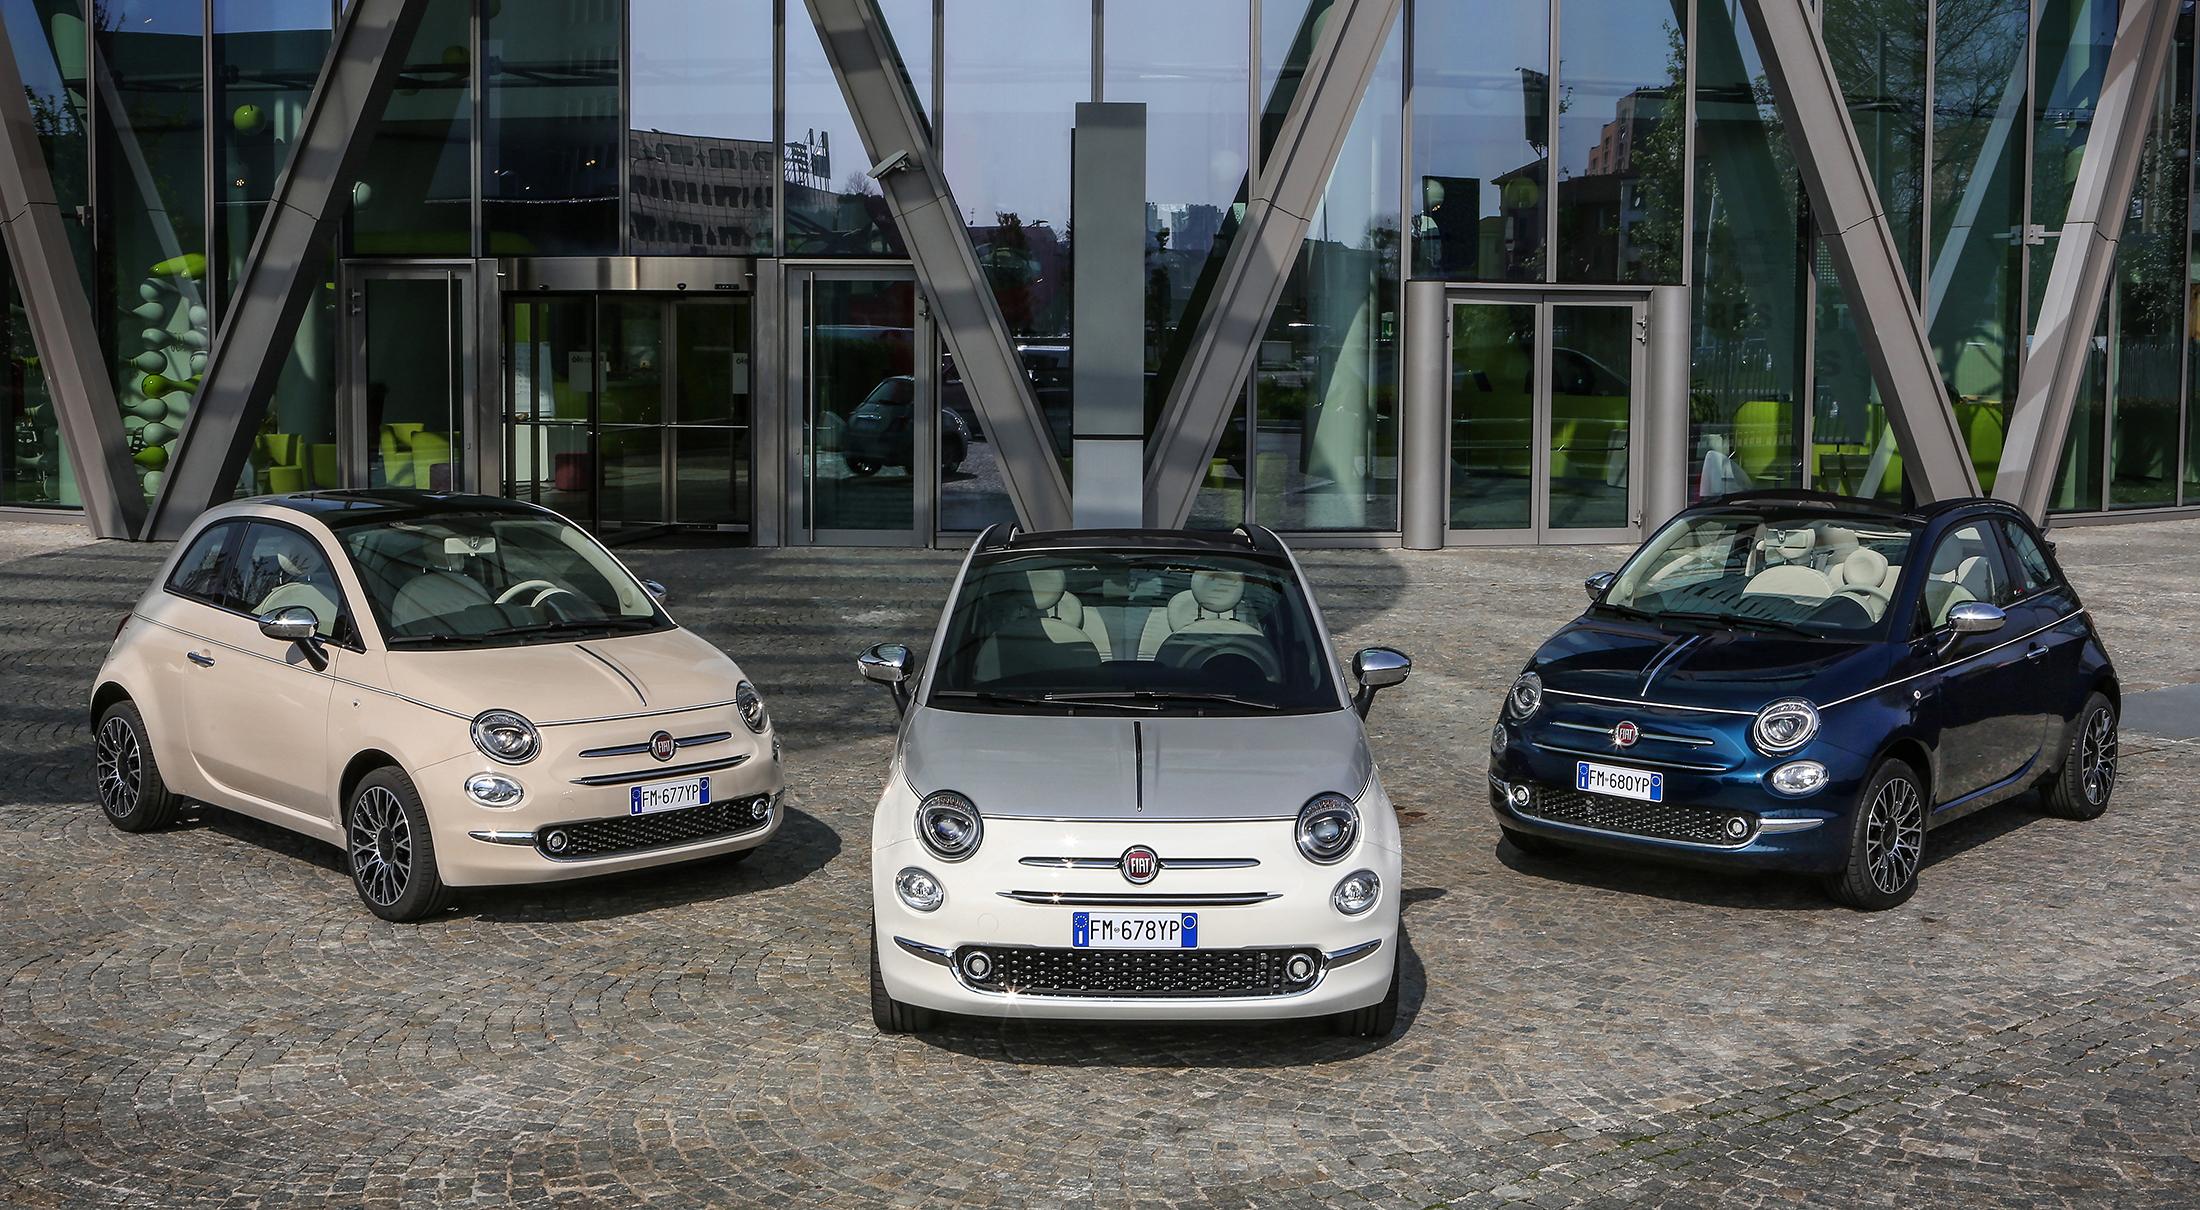 Fiat 500 photo